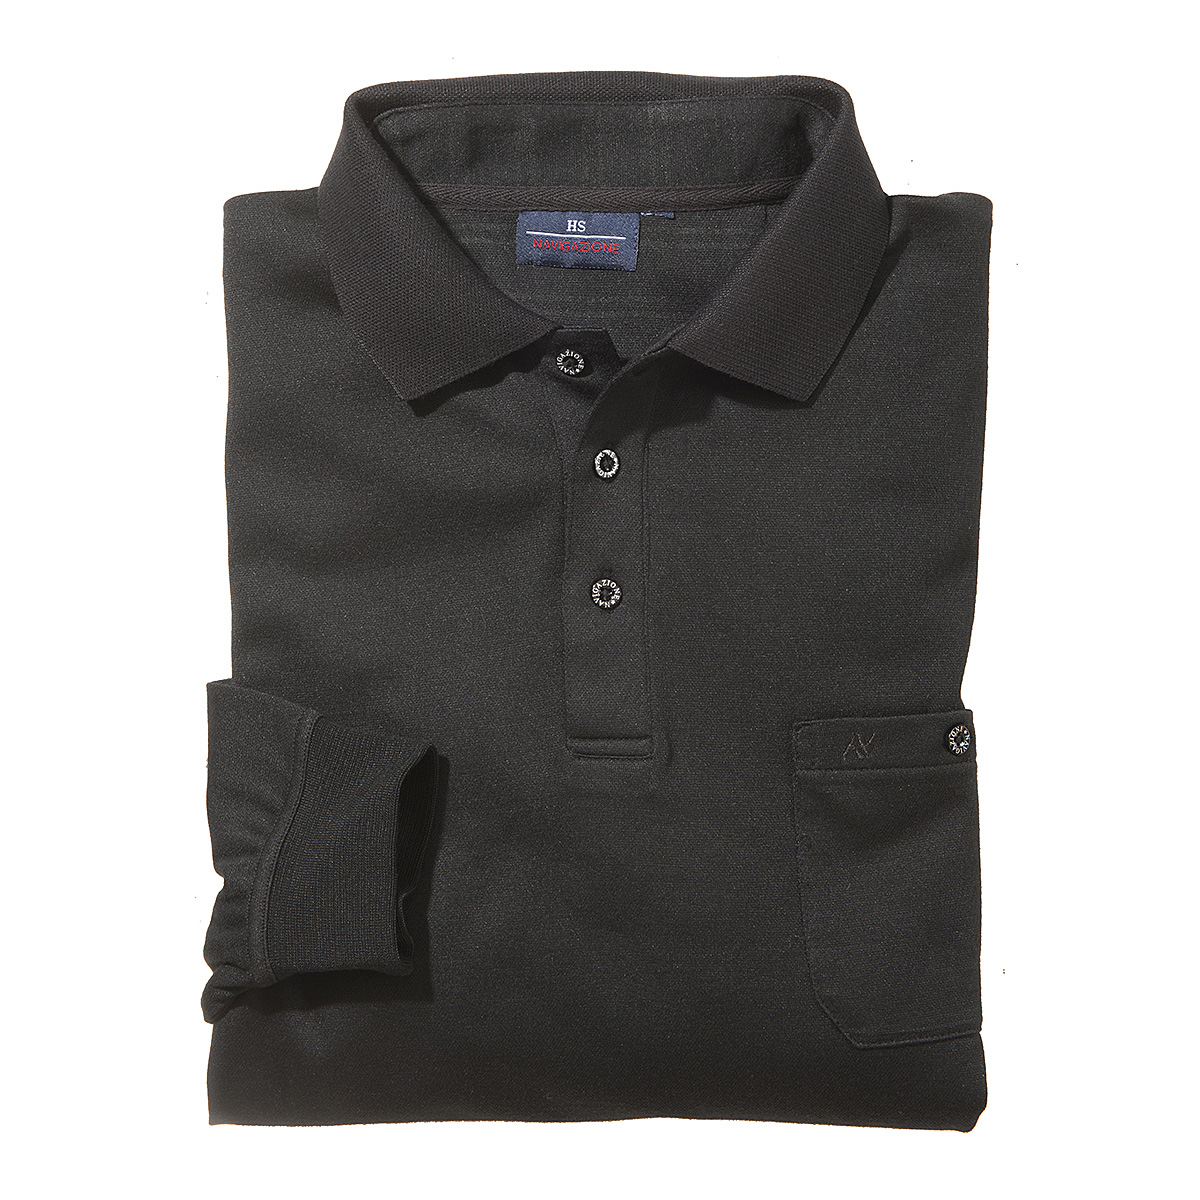 jersey hemd easy care mit polo kragen farbe schwarz gr enspezialist m nnermode. Black Bedroom Furniture Sets. Home Design Ideas